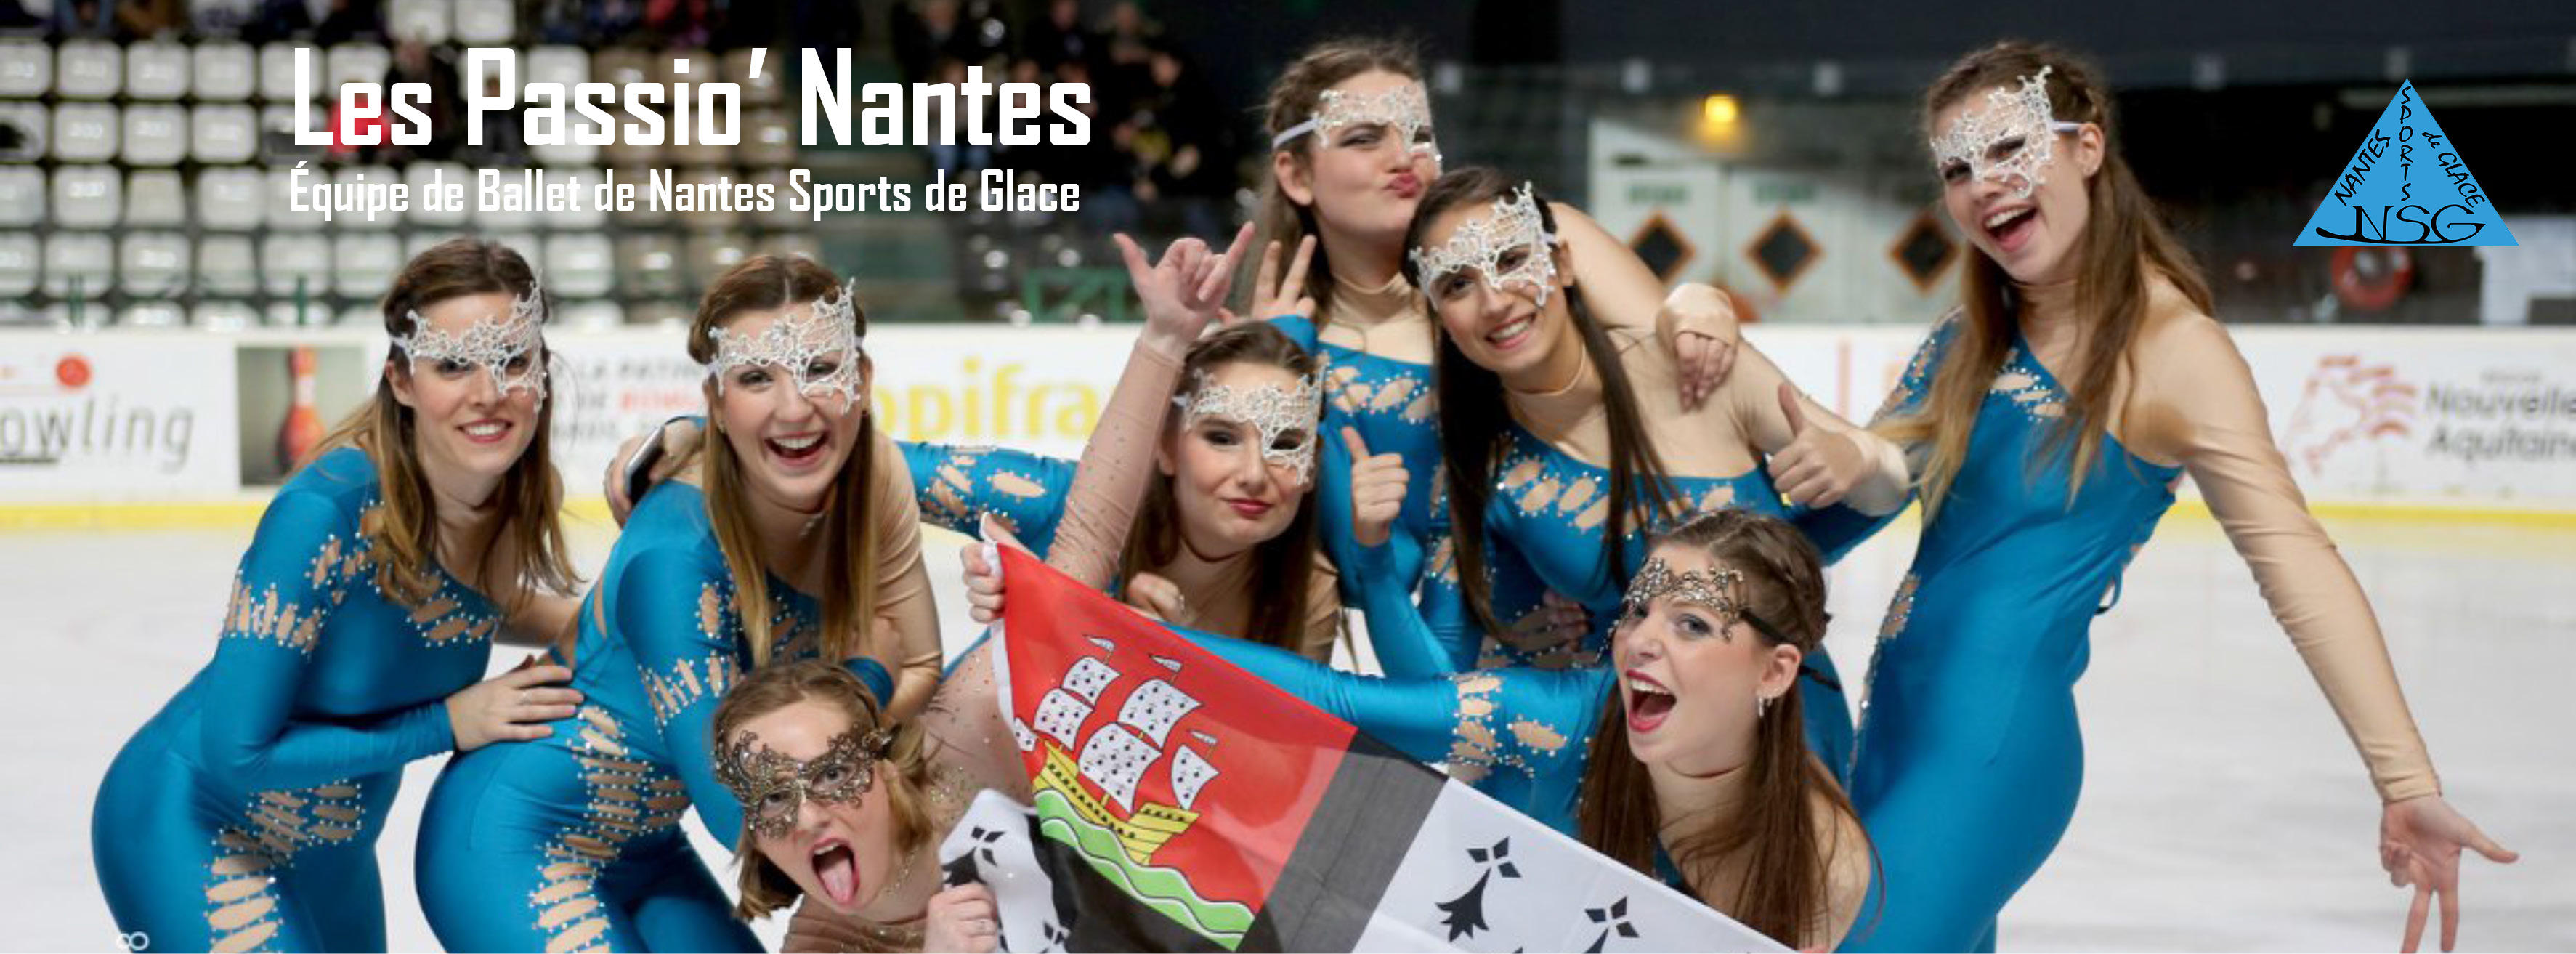 Passio'Nantes-NSG